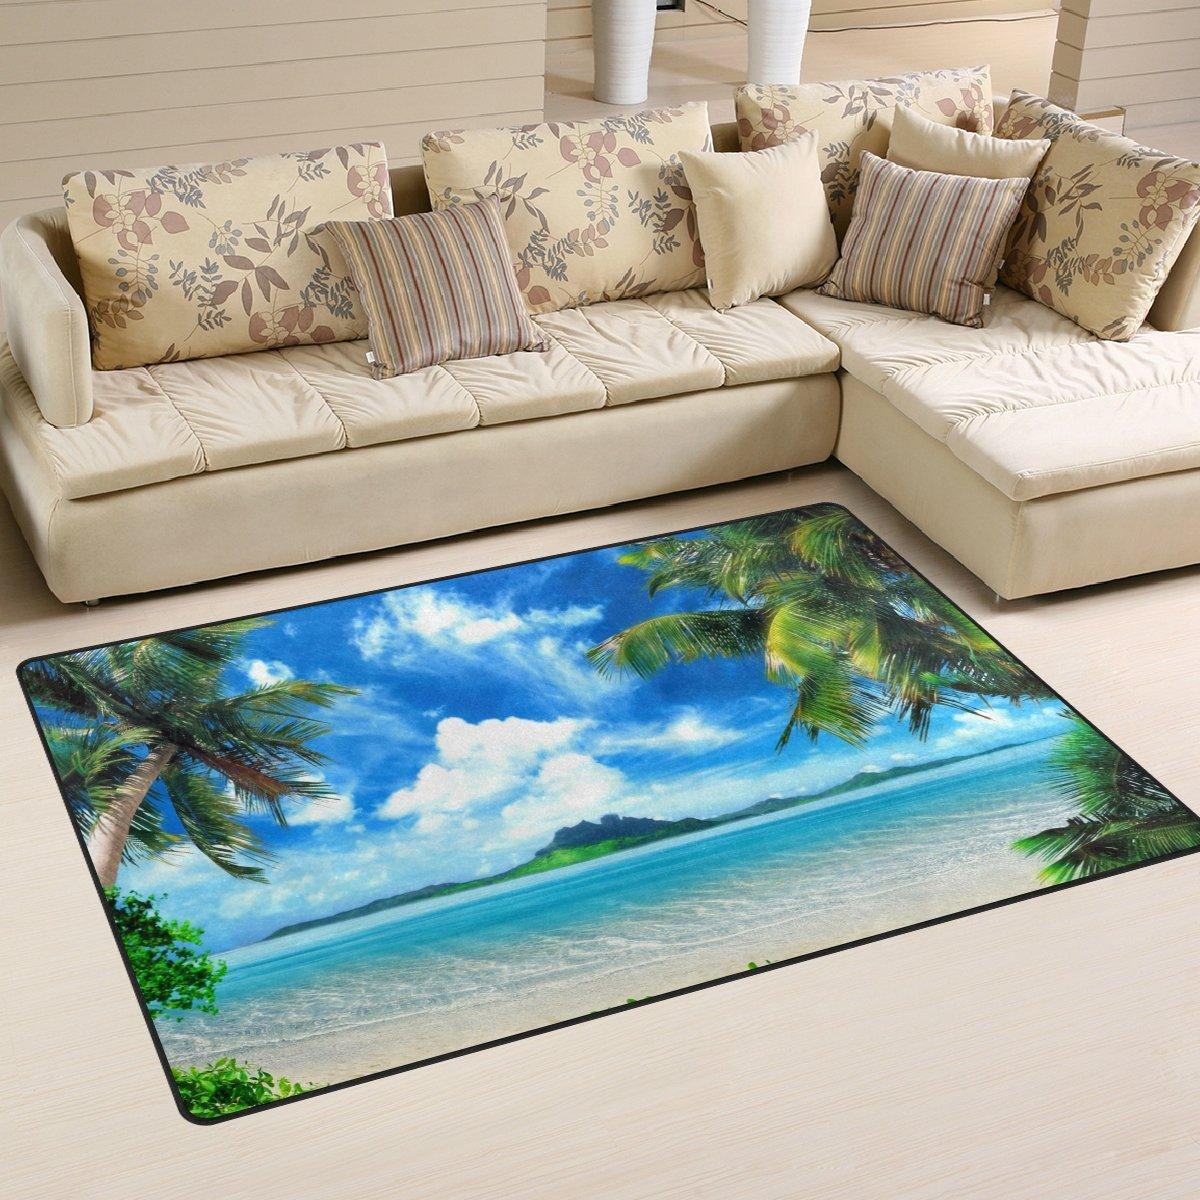 naanle Tropical Beach Palm Tree非スリップのエリアラグリビングダイニングルームベッドルームキッチン、1.7 X 2.6 ' (20 x 31インチ、海オーシャンNurseryラグ床カーペットヨガマット, 3' x 5' 3096267p146c161s241 1 B07B4TQZ9K 3' x 5' マルチ マルチ 3' x 5'